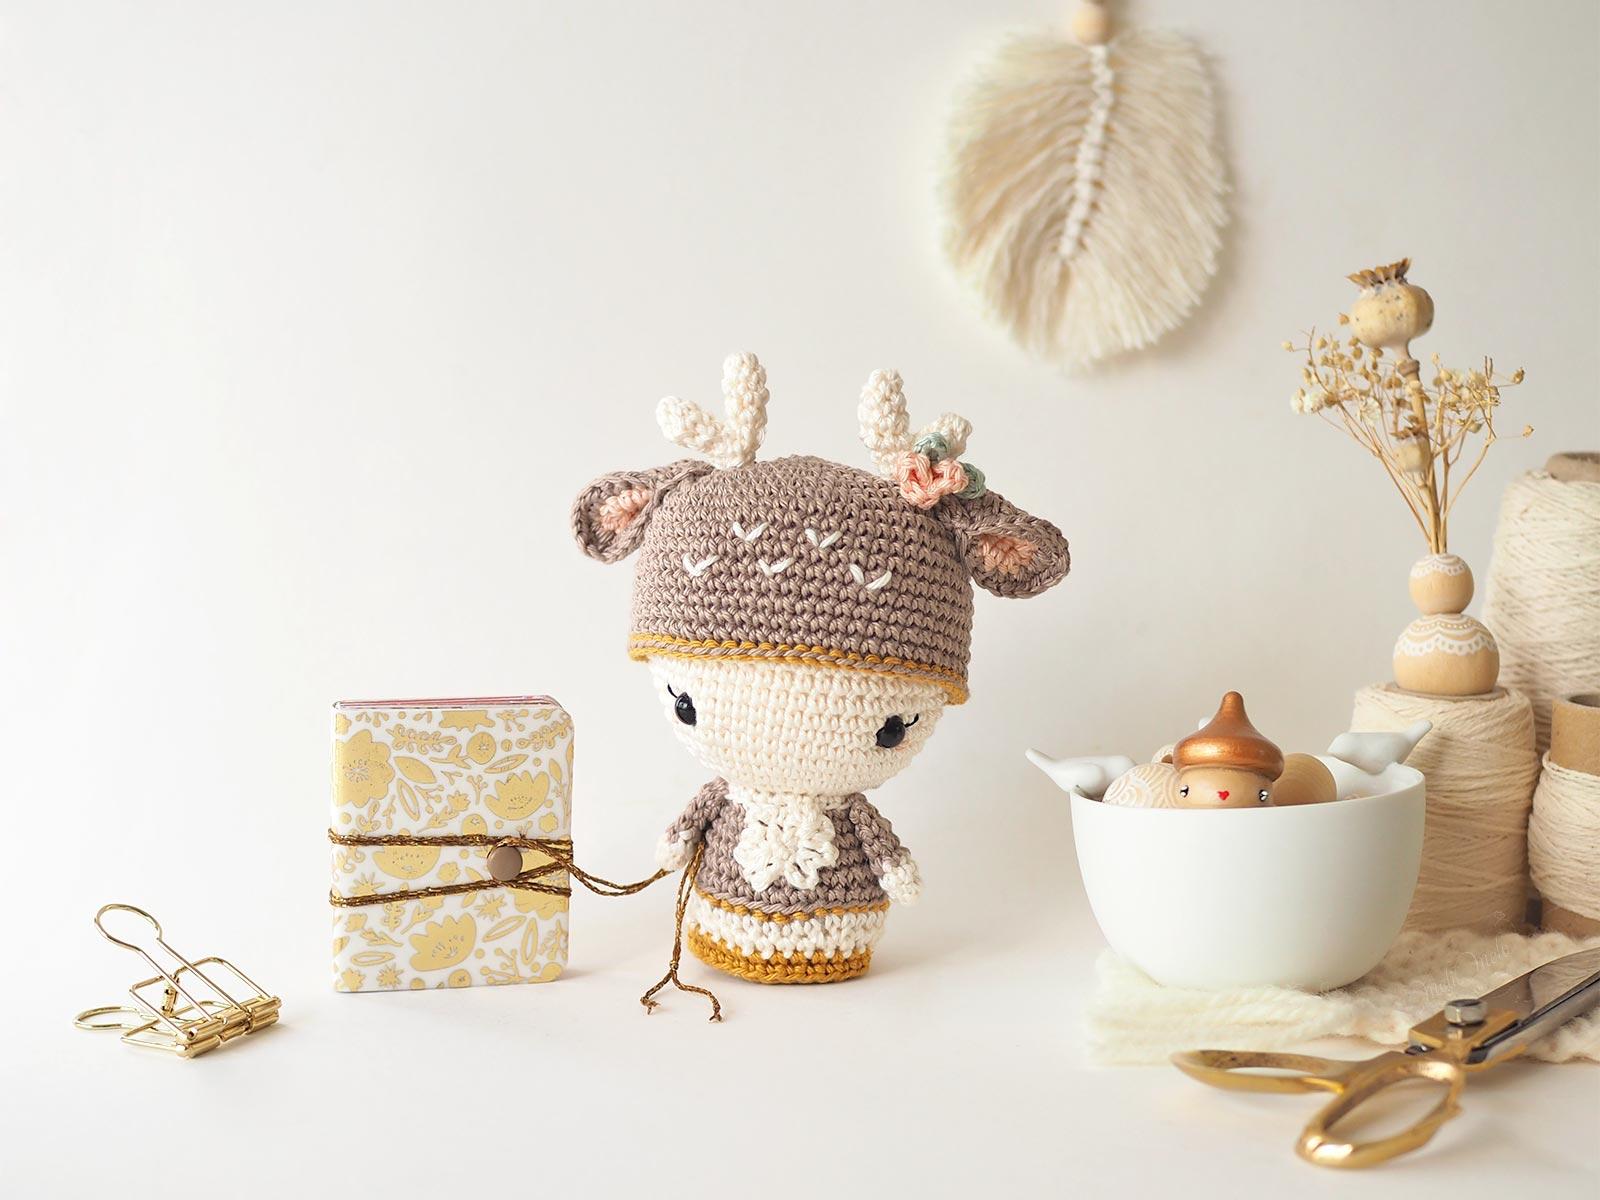 scrapbooking crochet mini album amy tangerine annie deer aradiya toys laboutiquedemelimelo